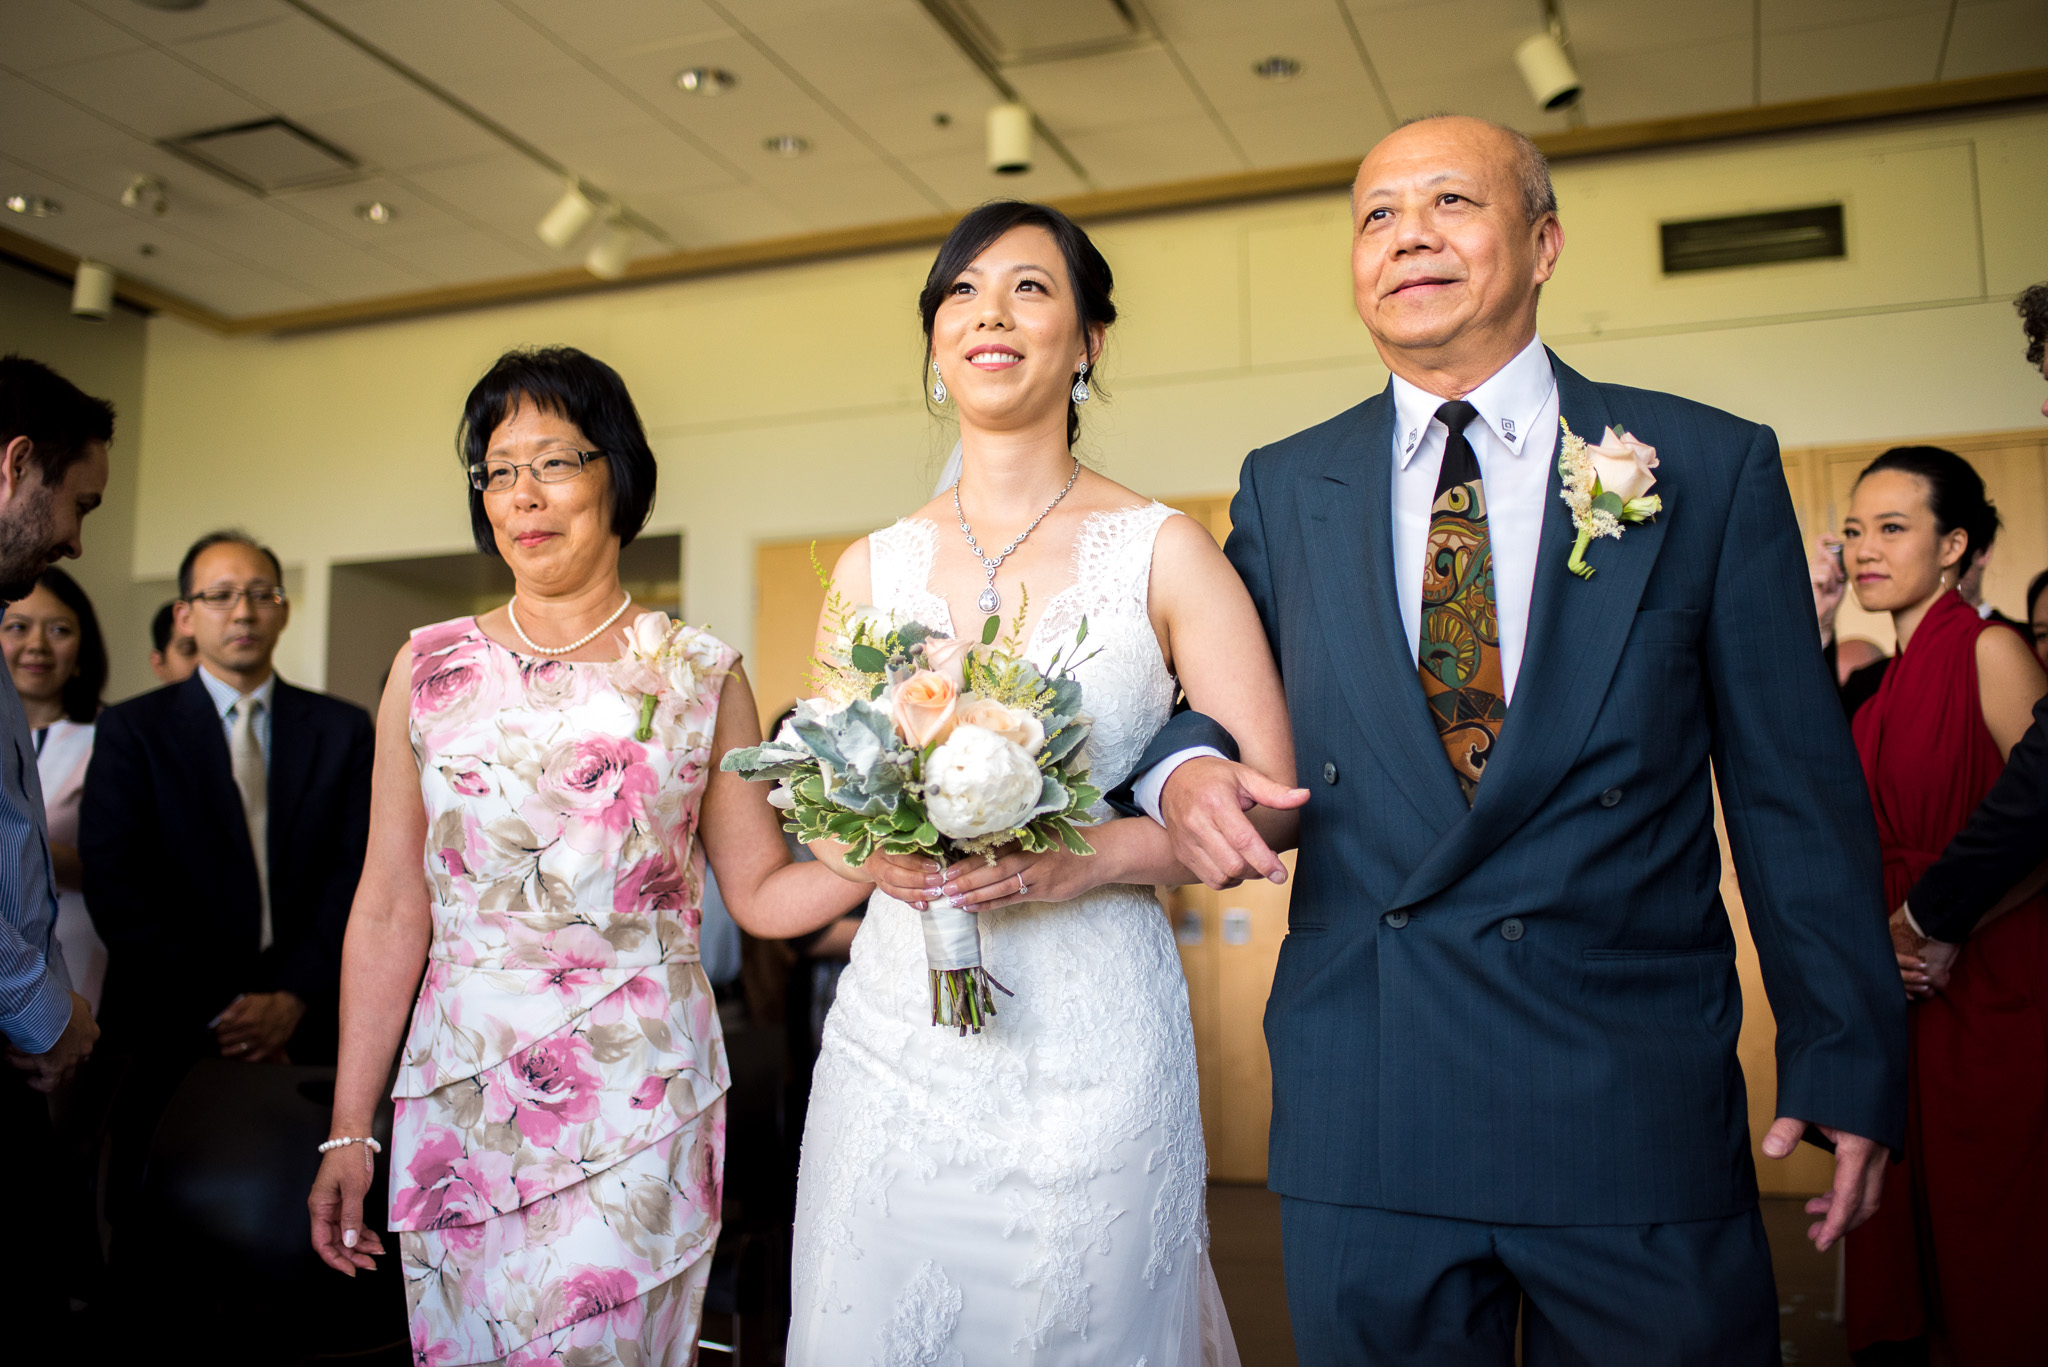 Vancouver Wedding Photography-37.jpg